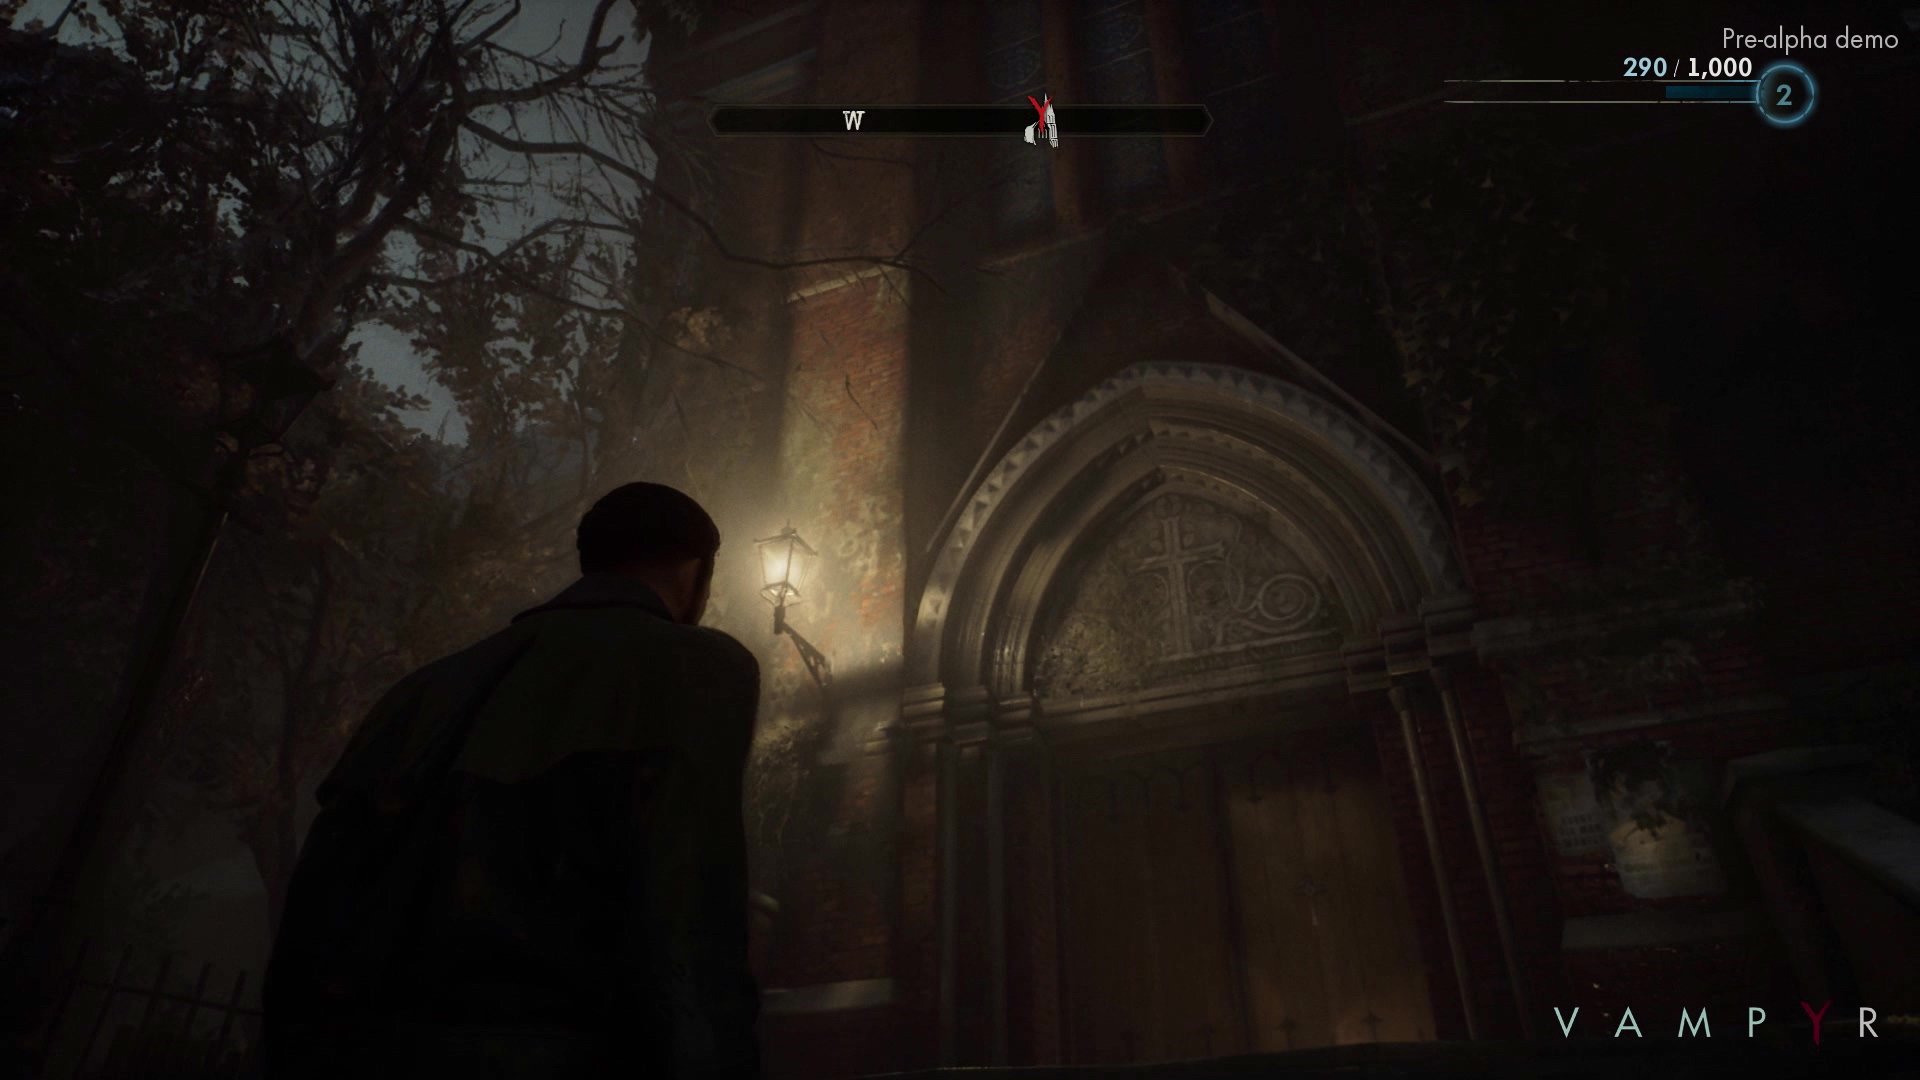 vampyr-screenshot-02